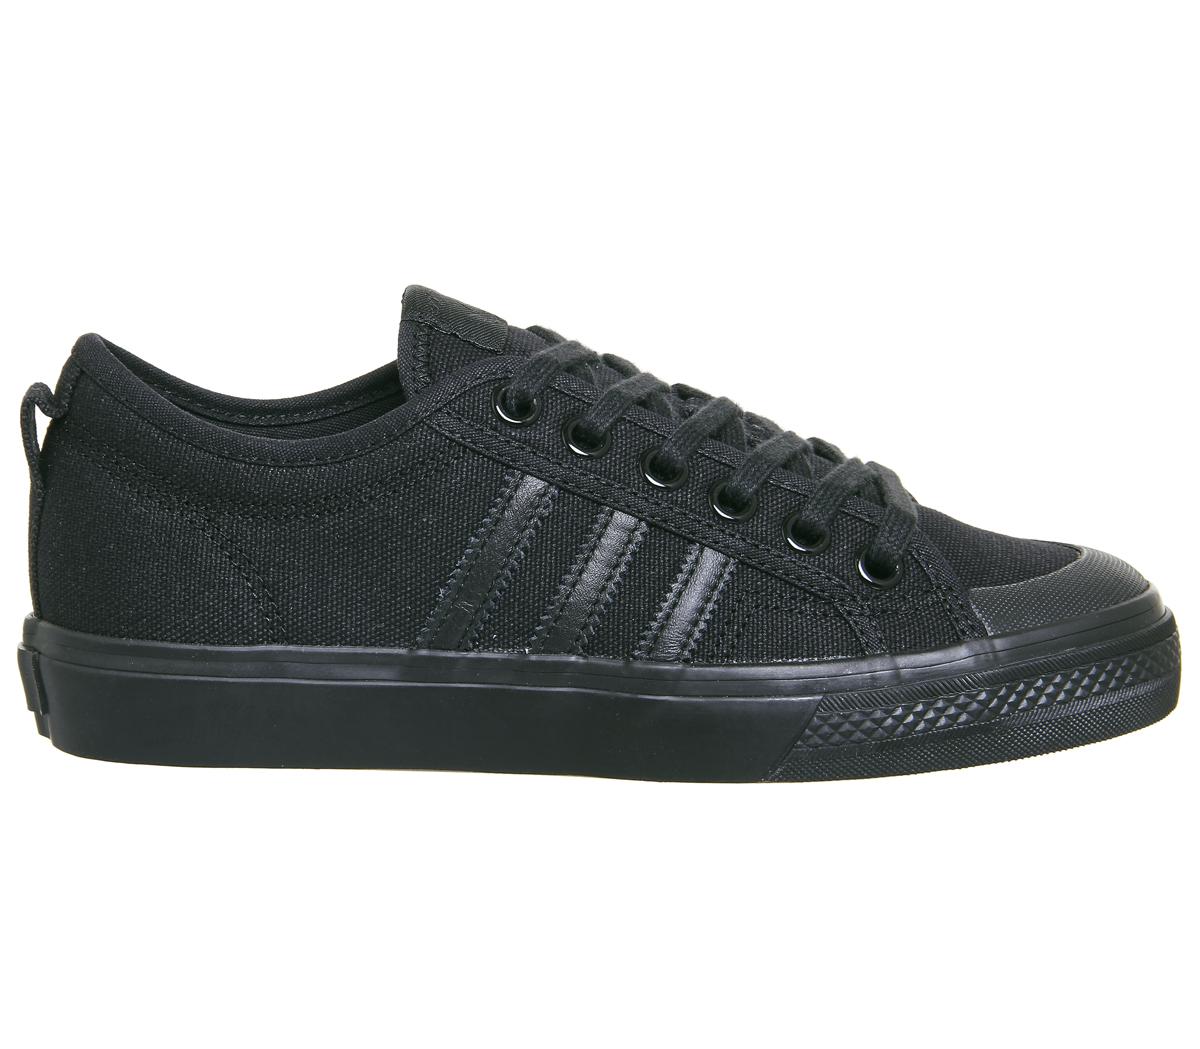 Mens Mens Mens Adidas Nizza Trainers noir MONO Trainers chaussures 068bc3